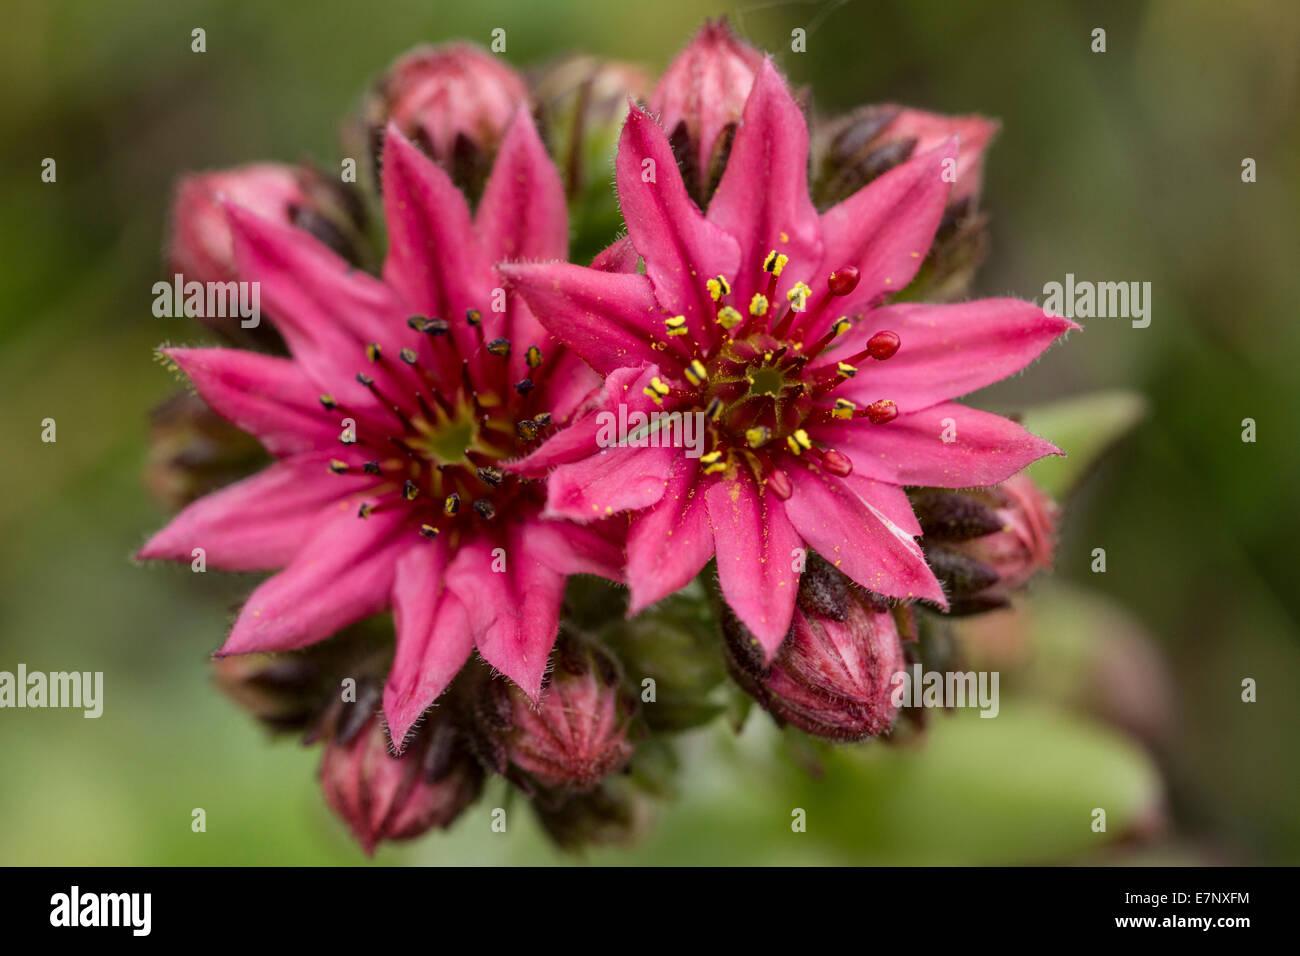 Nature, Plant, Flower, lila, houseleeks, Sepervivum, Crassulaceae, Switzerland - Stock Image